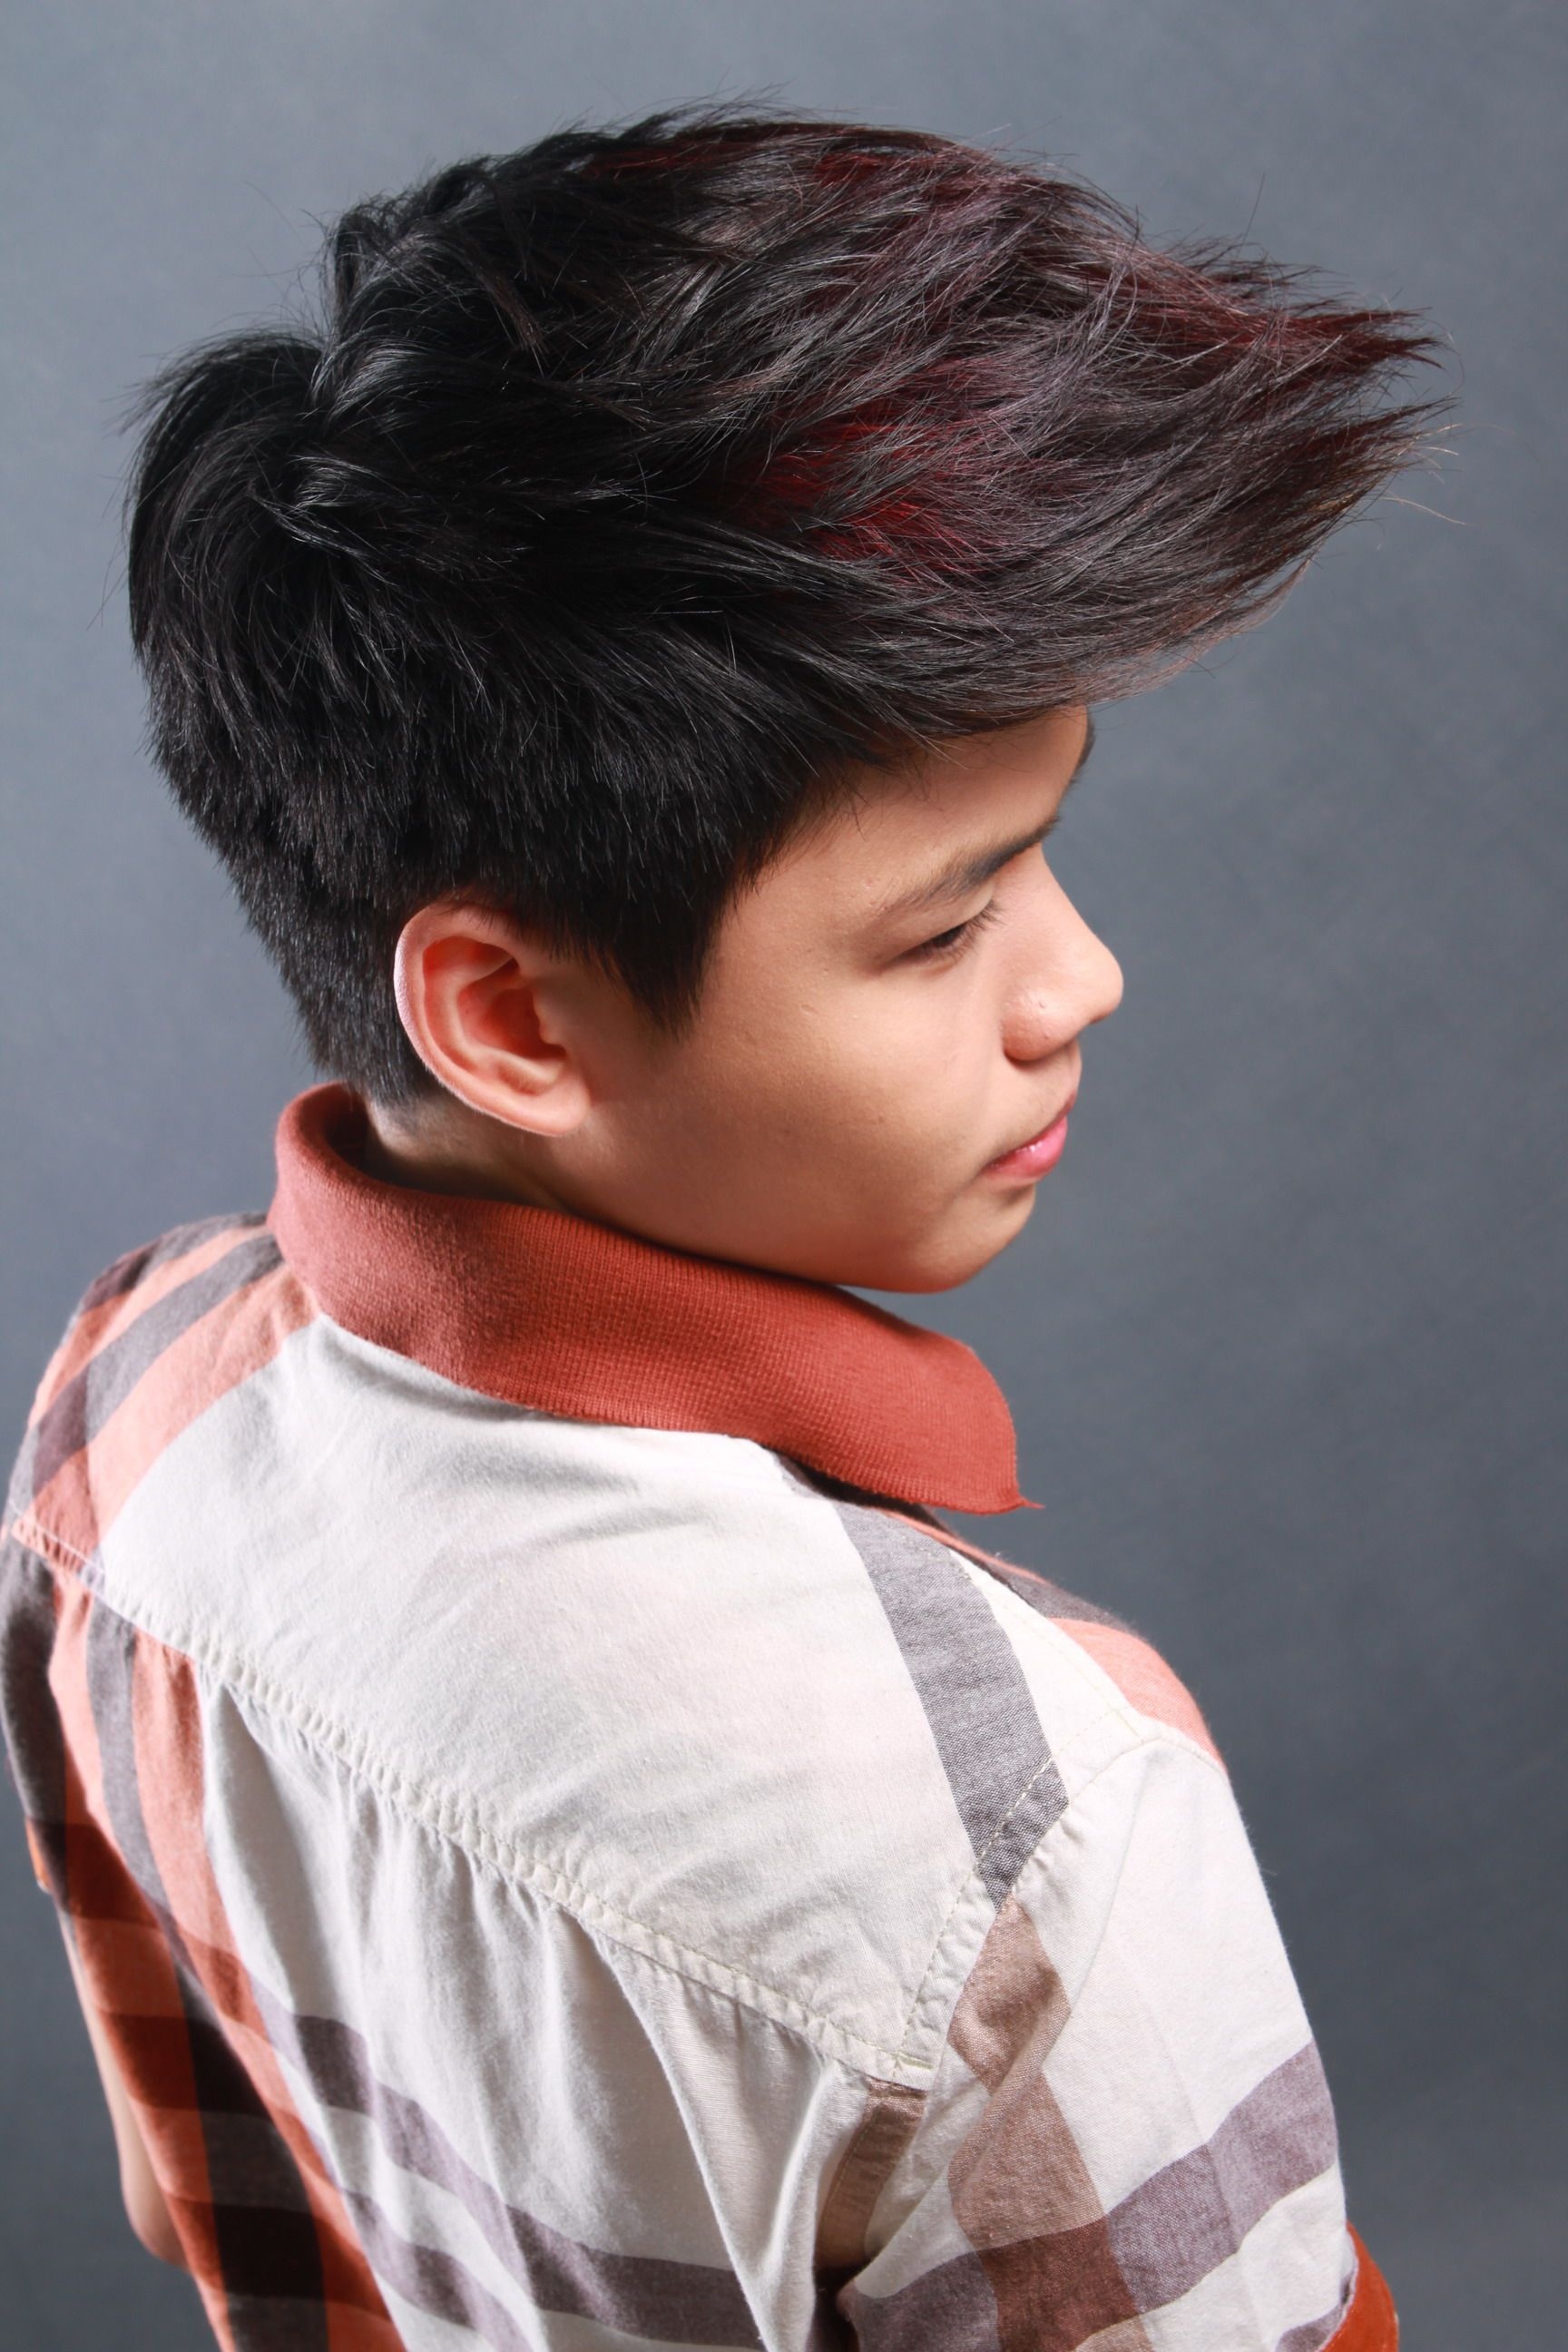 Hair Cut And Hair Color By Richard Christian Salon Semarang